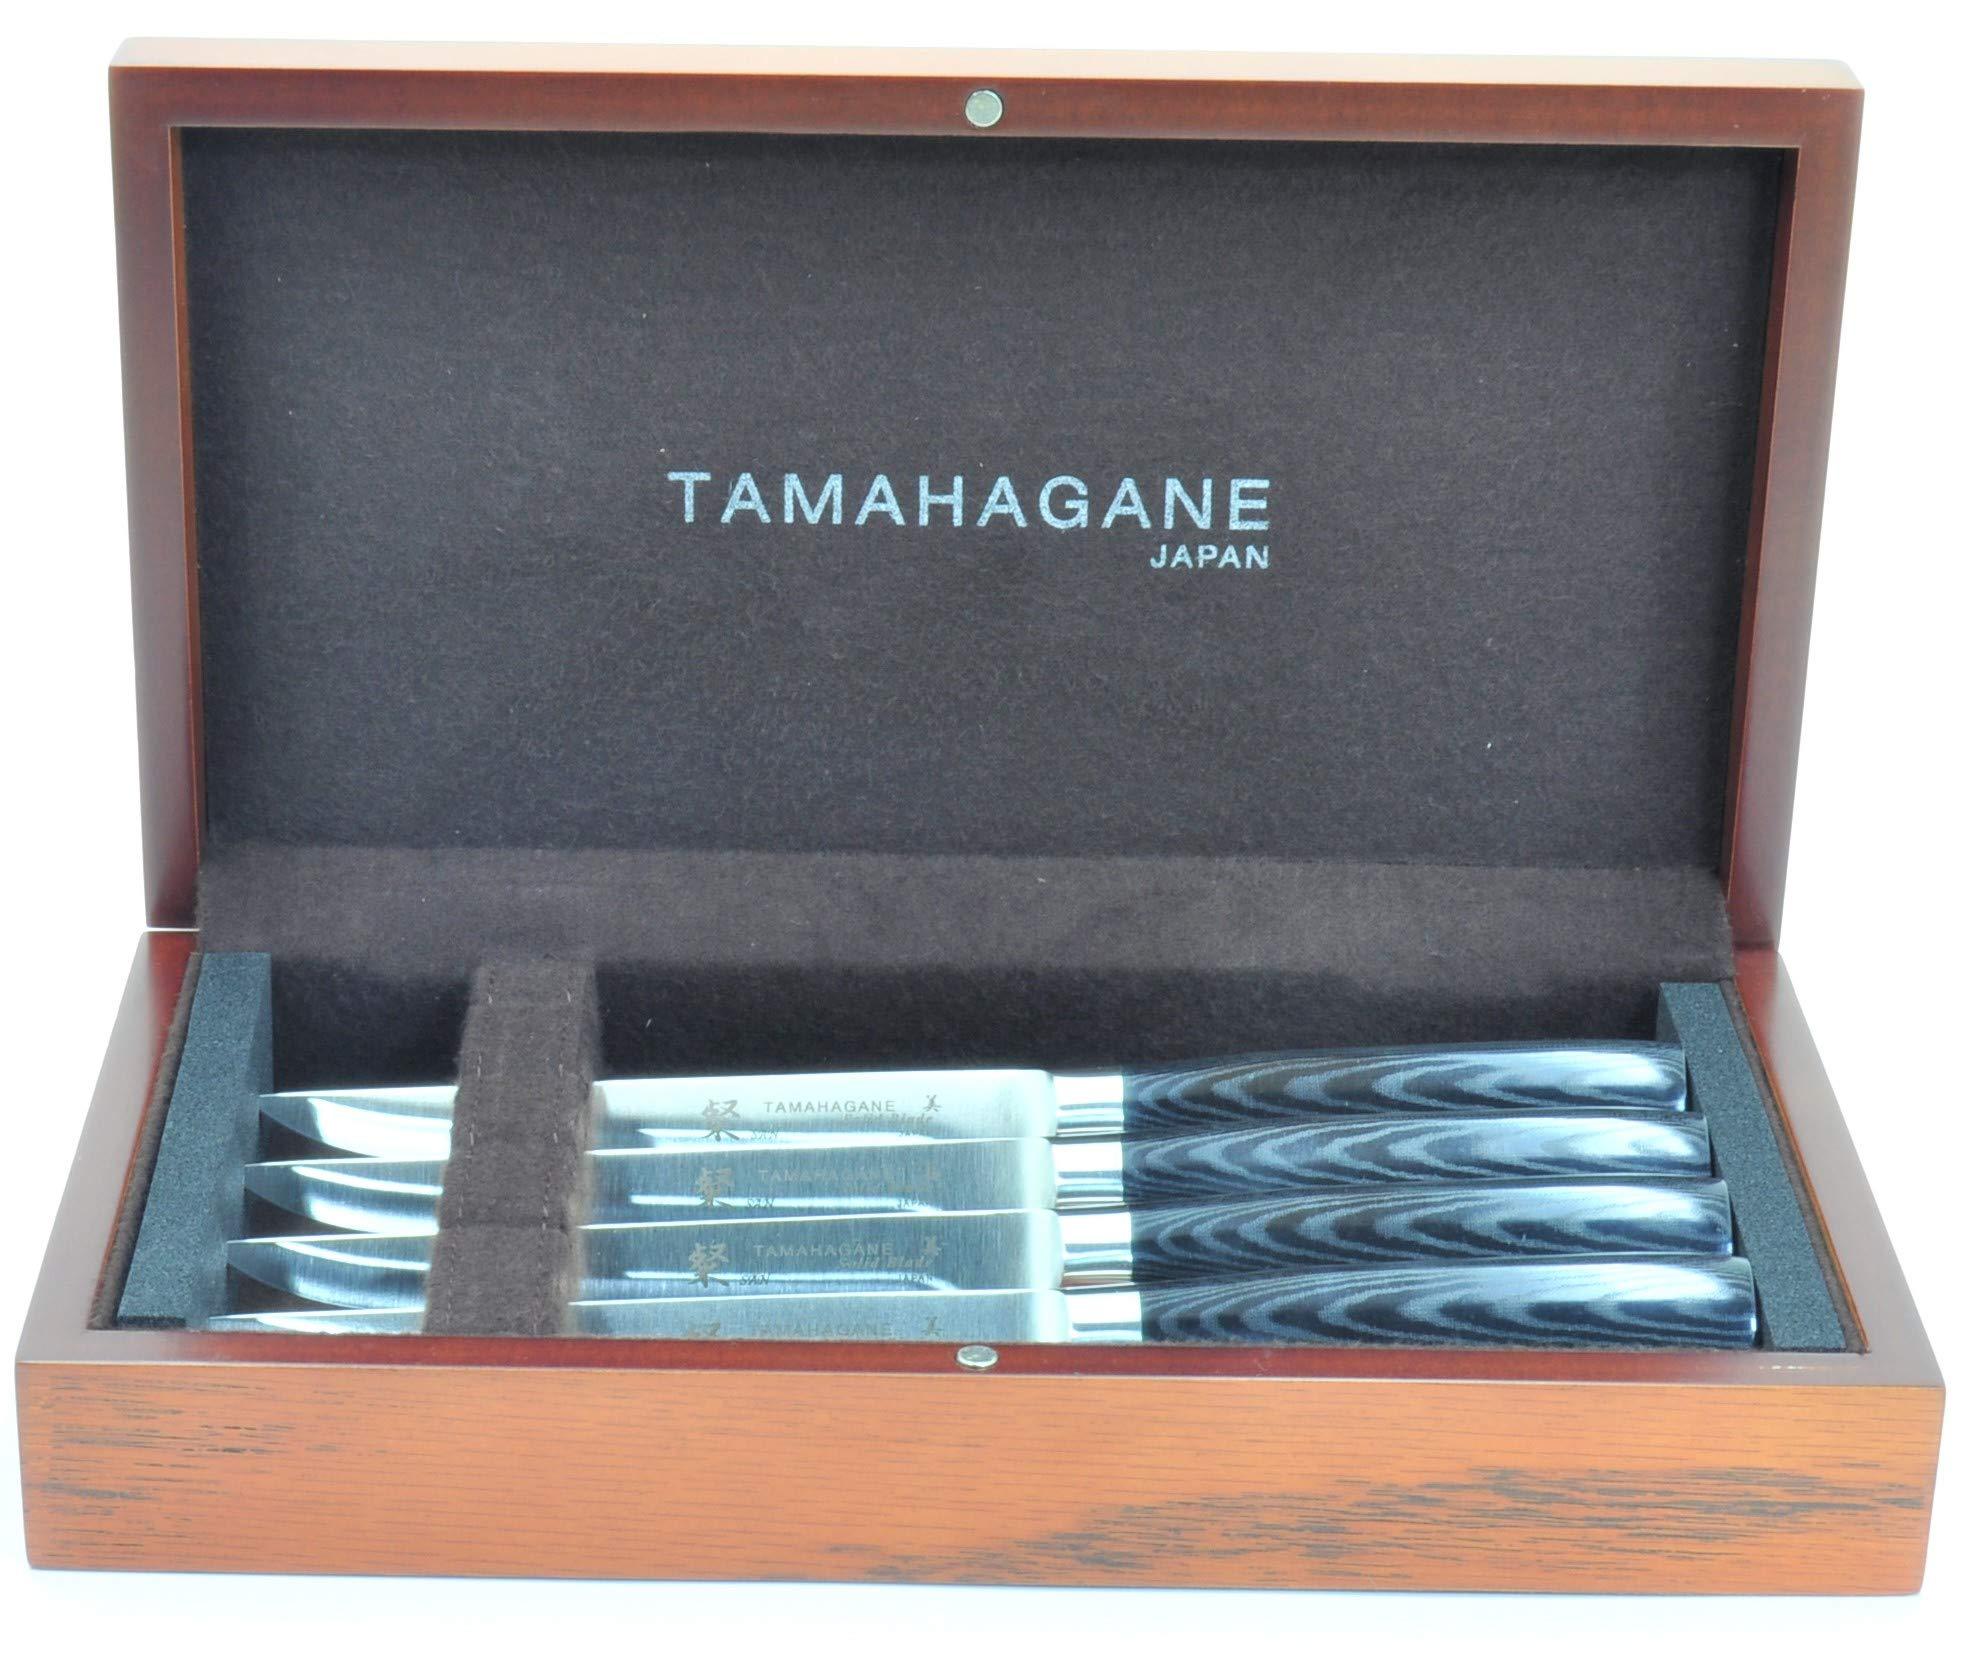 Tamahagane Tsubame Mikarta Stainless Steel 4-Pc Steak Knife Set in wooden case